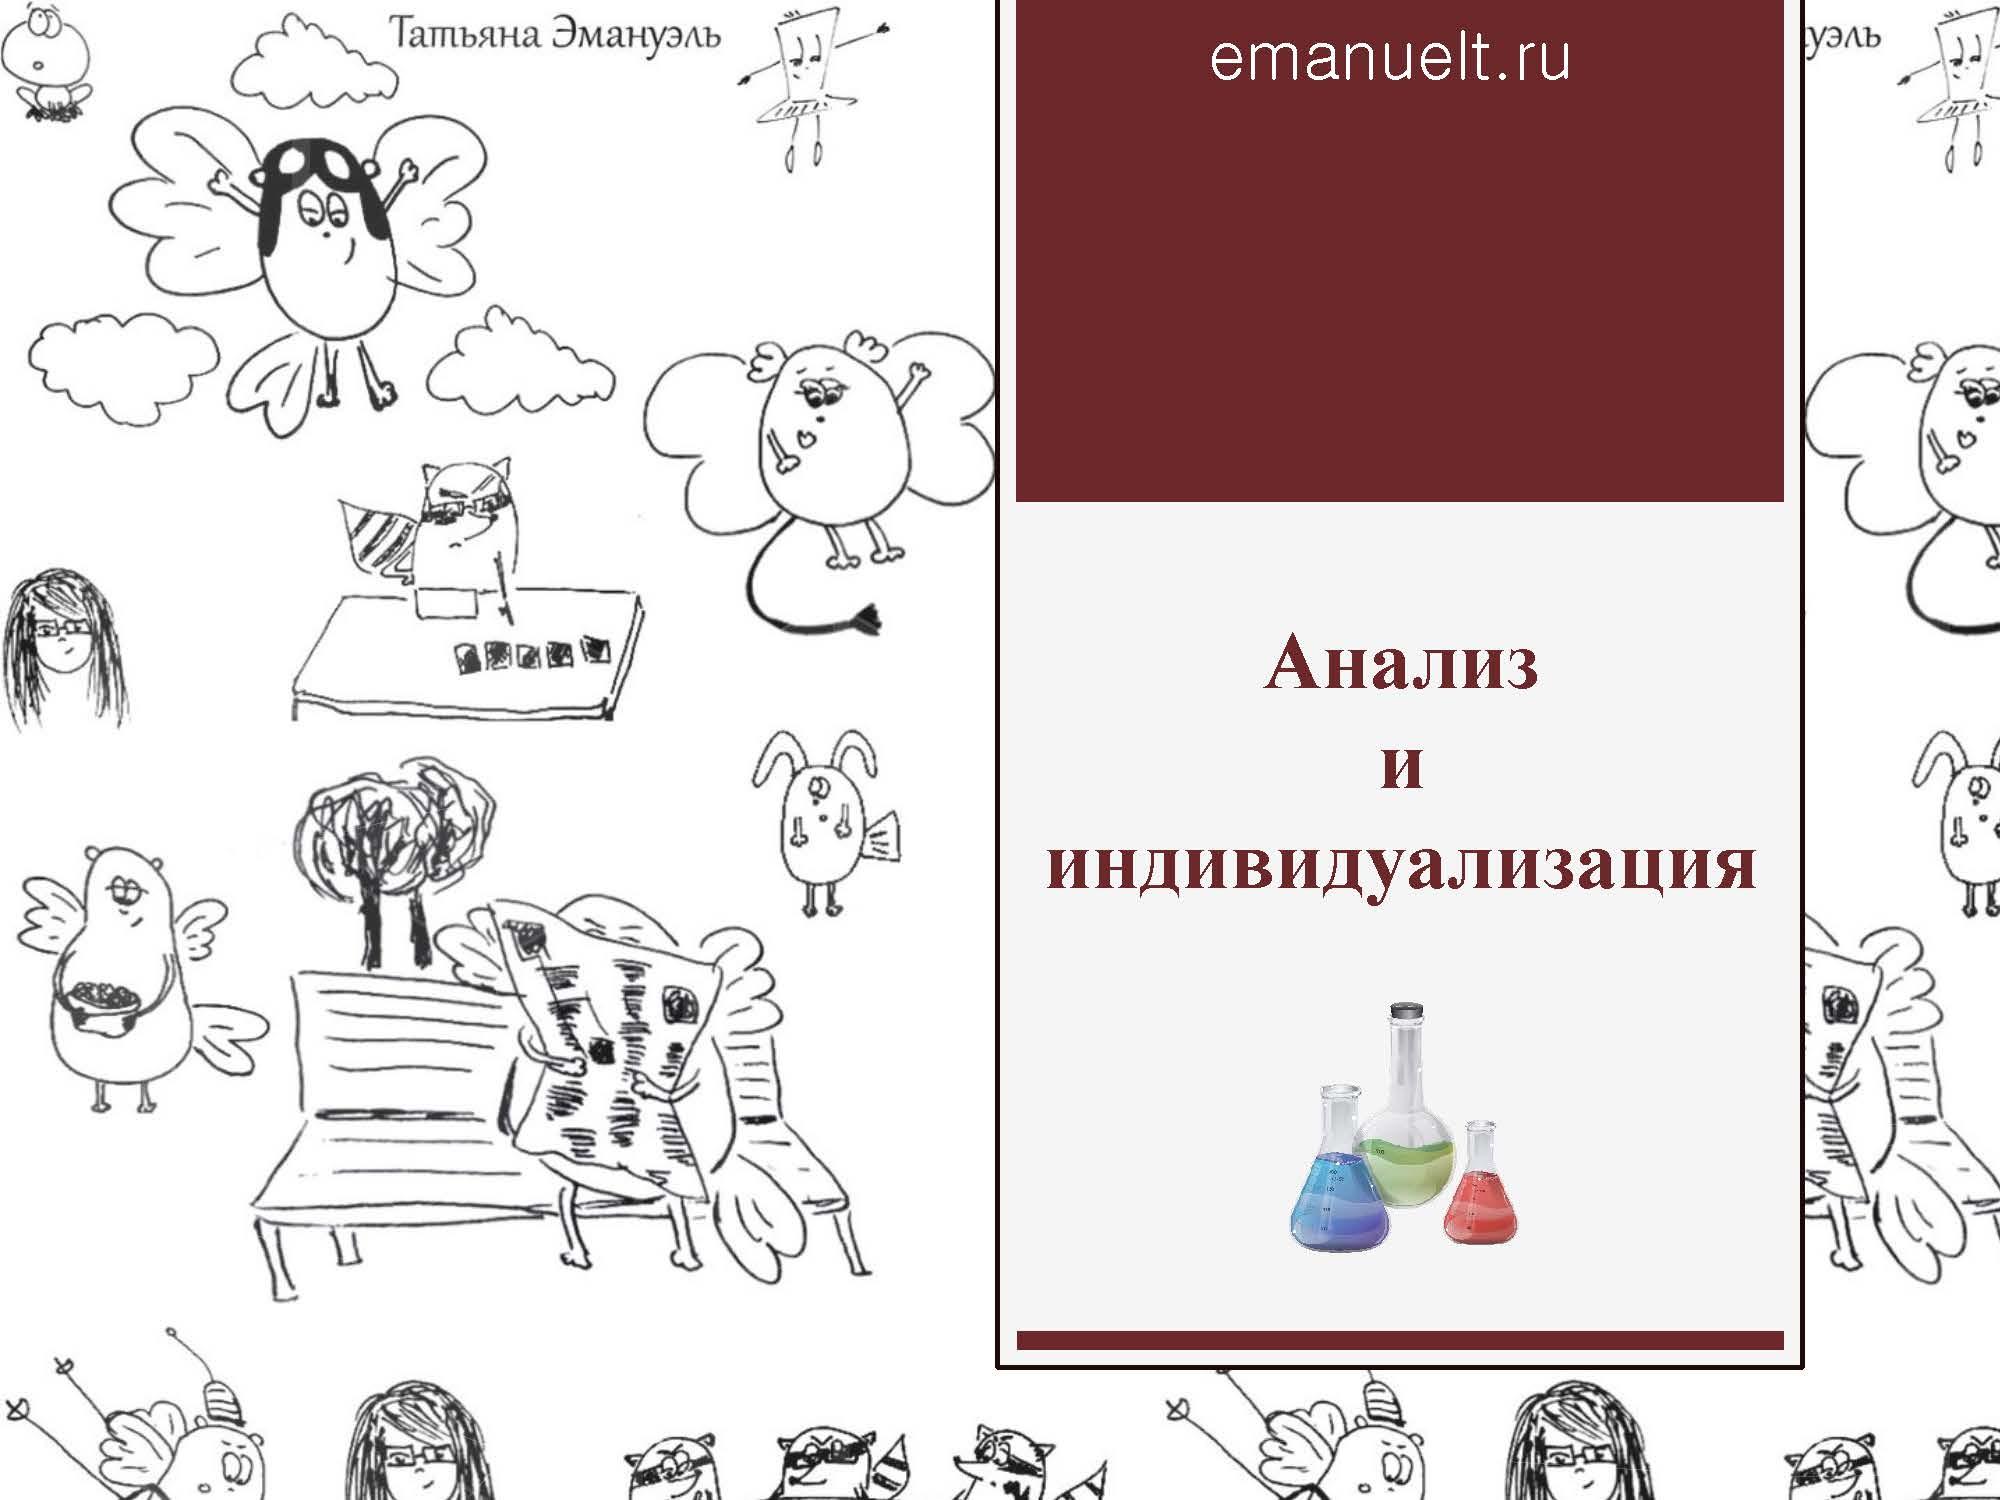 06 февраля эмануэль_Страница_020